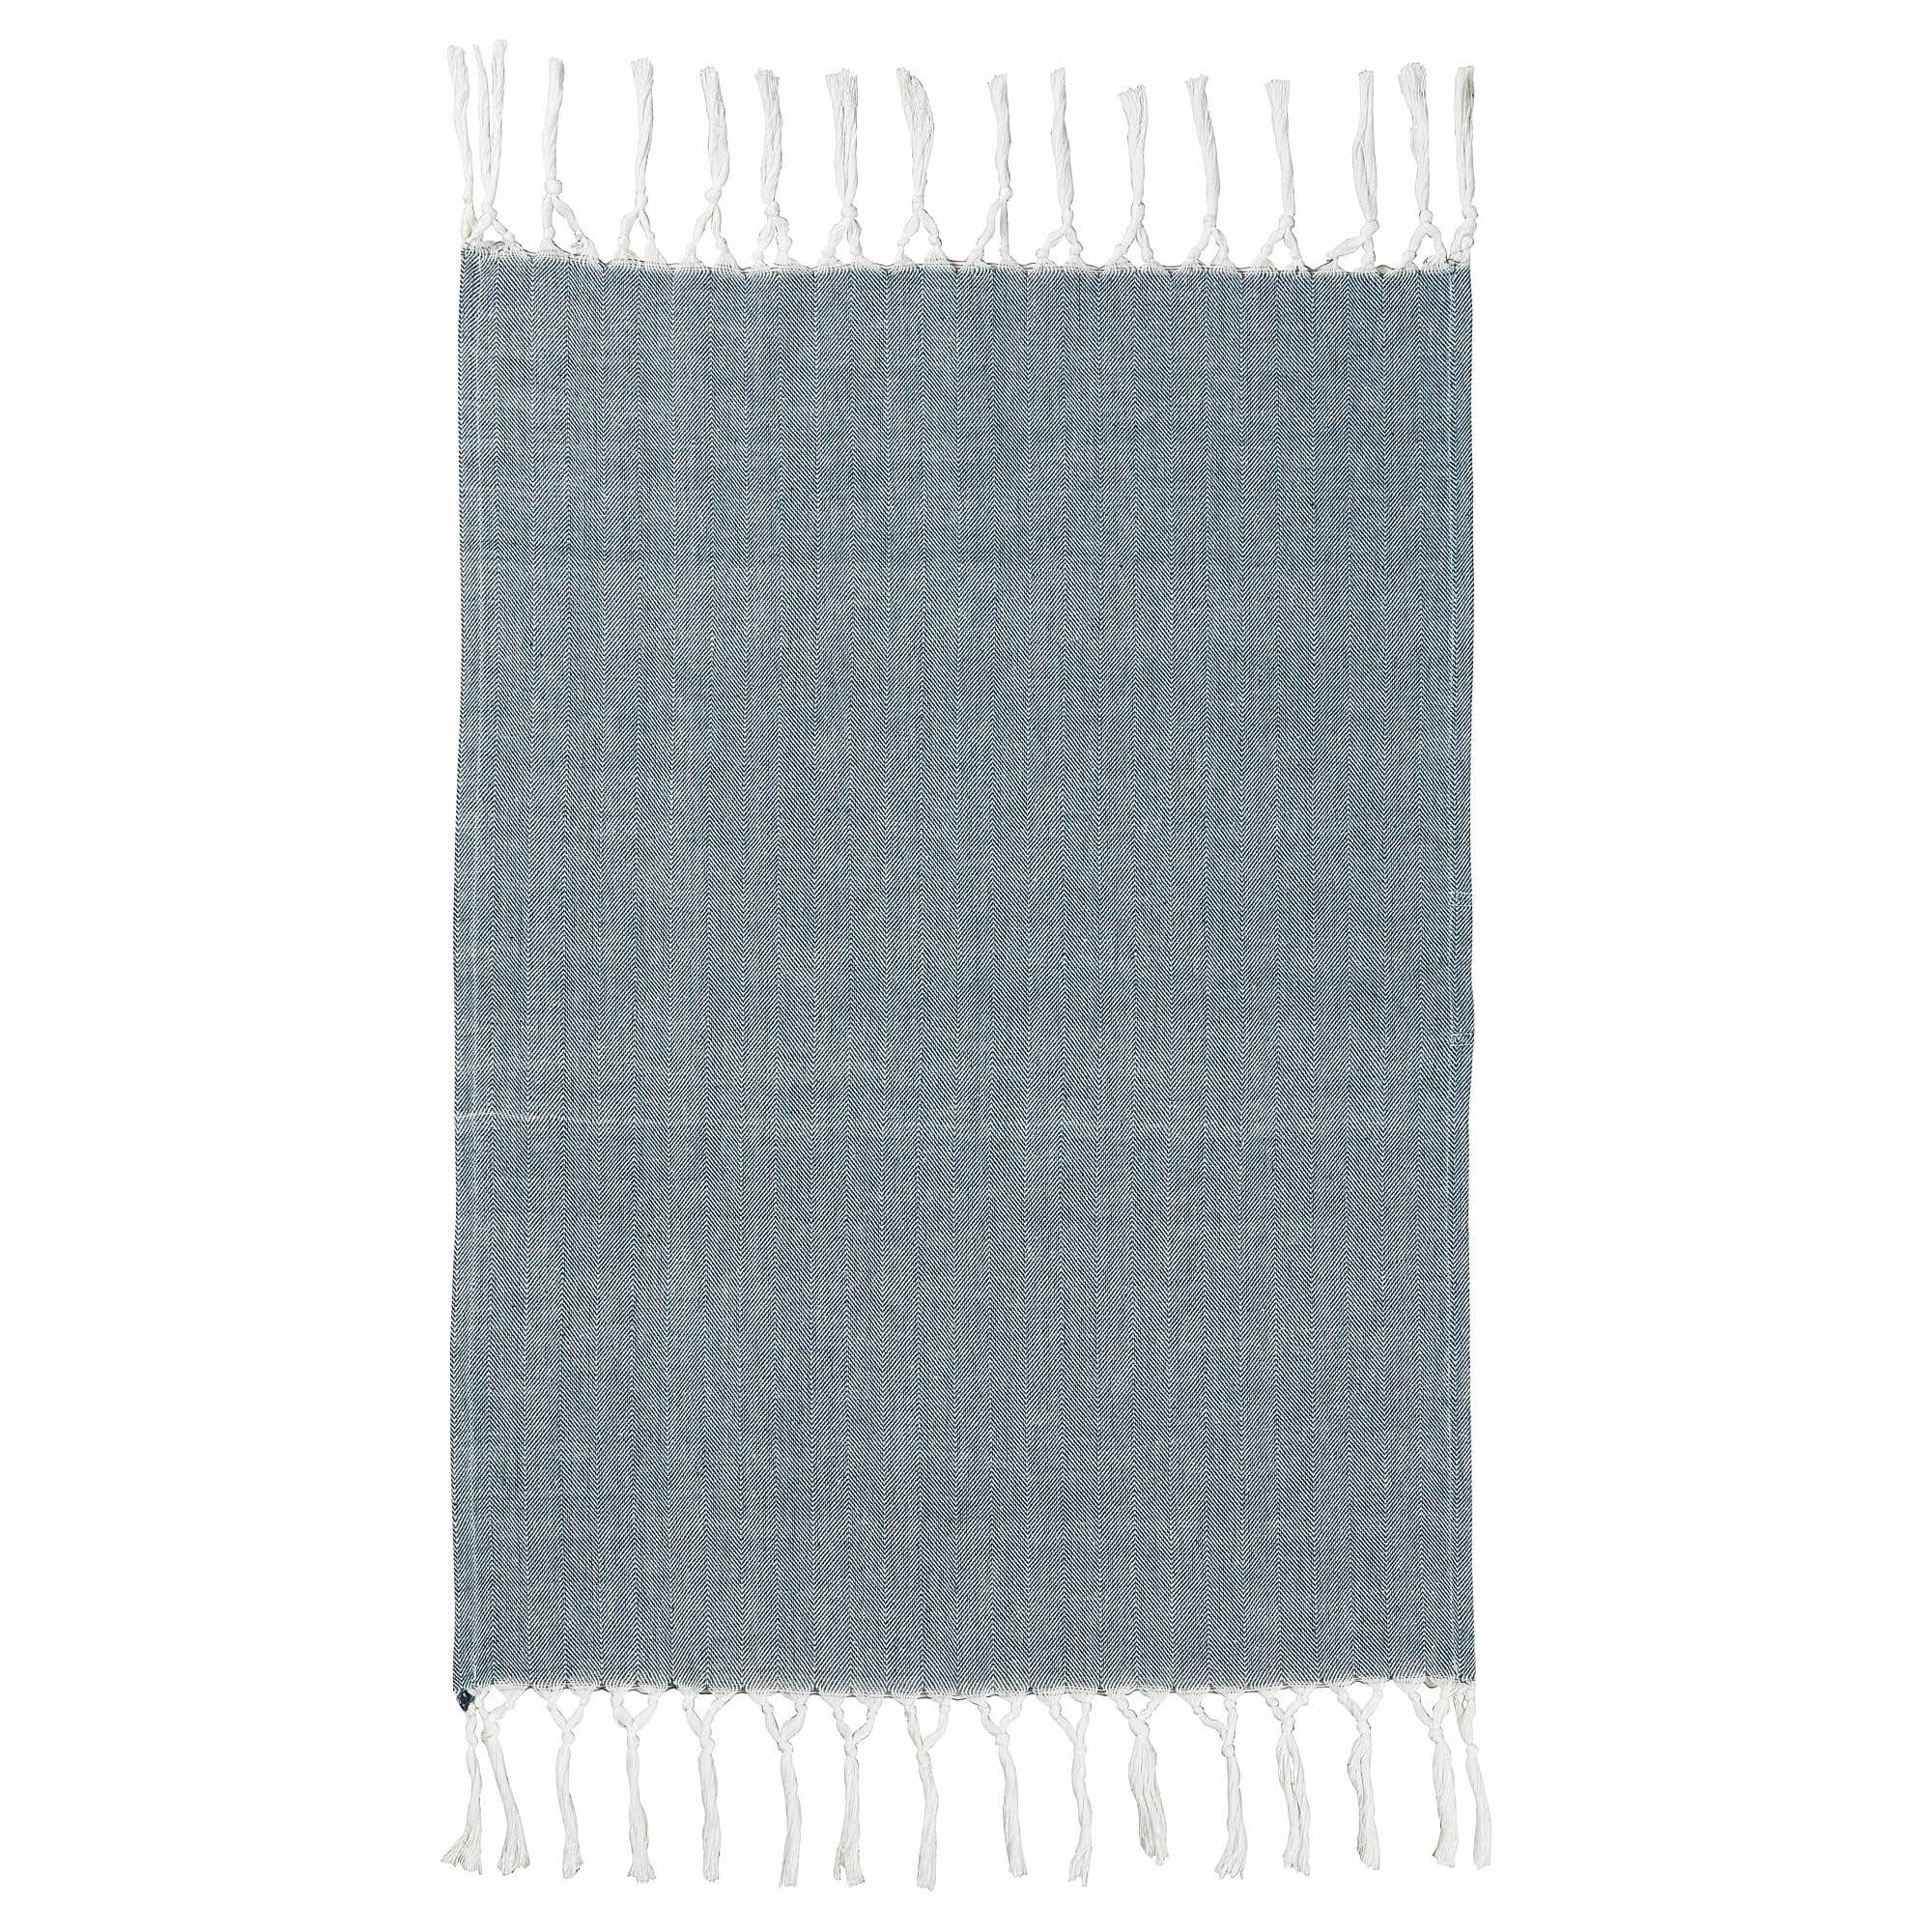 IKA INNEHÅLLSRIK Tea towel, handmade dark blue